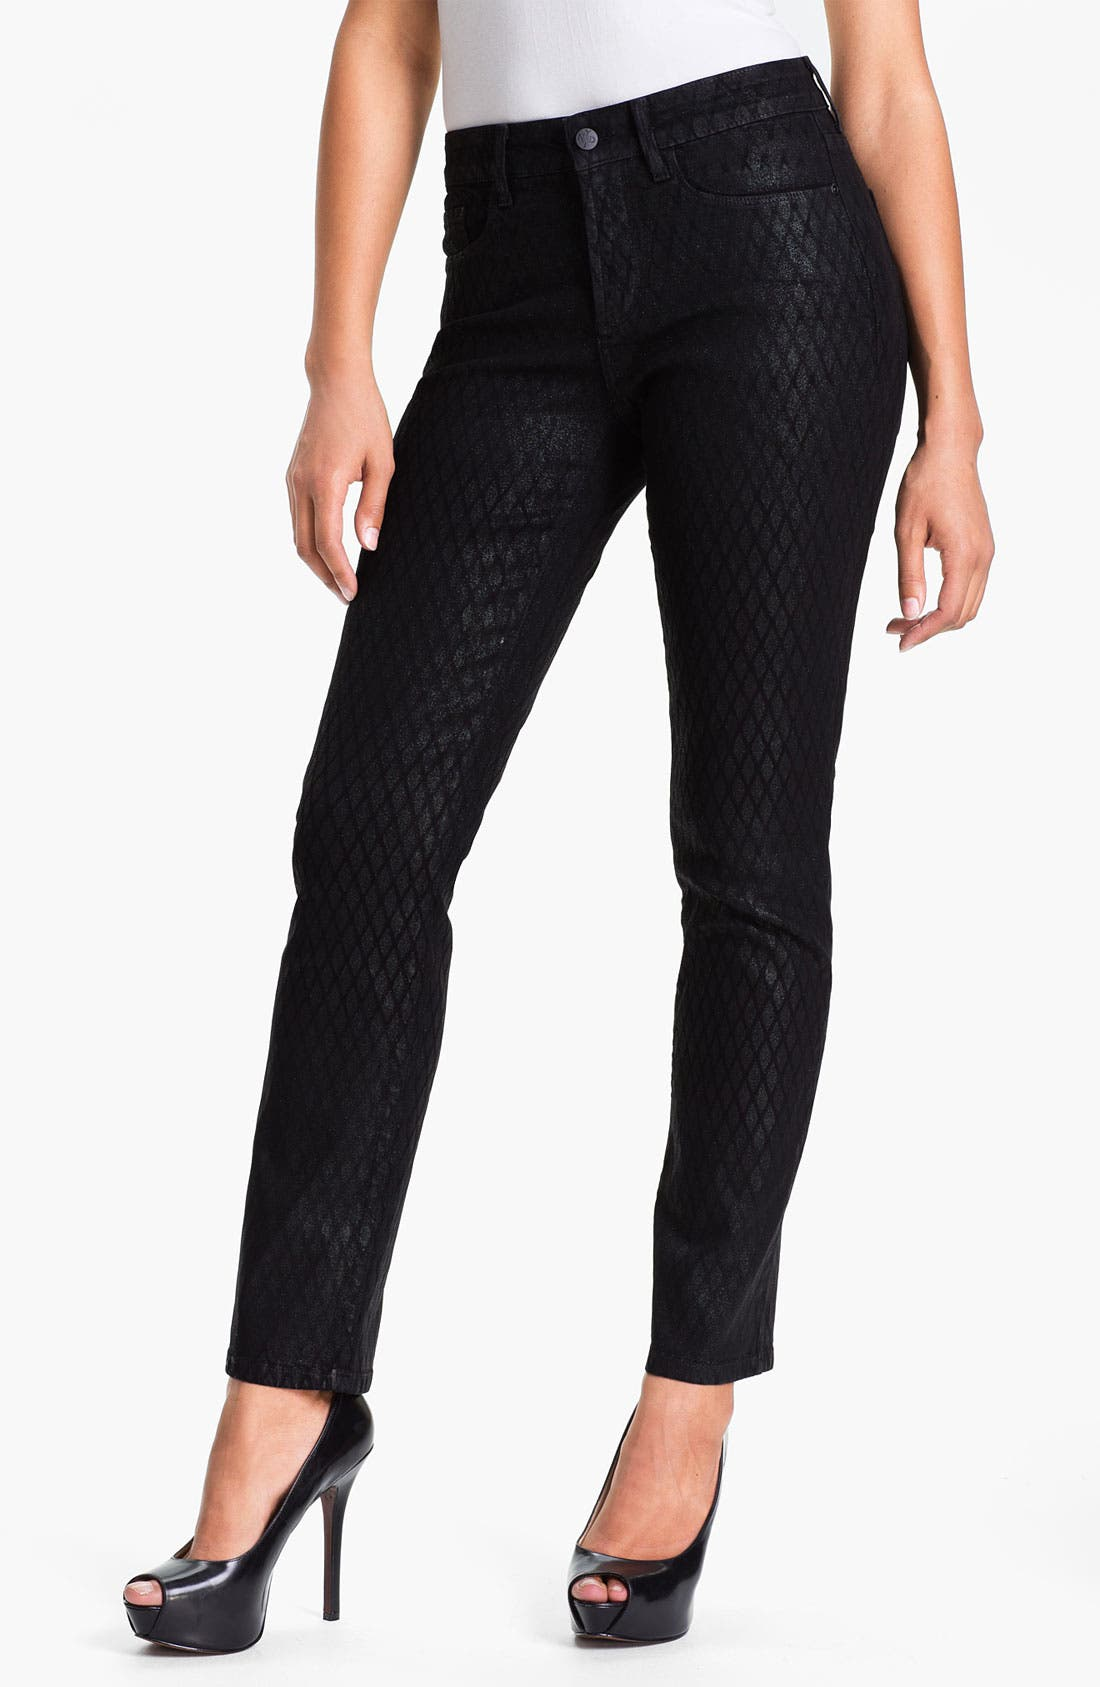 Alternate Image 1 Selected - NYDJ 'Sheri' Geometric Glitter Coated Skinny Stretch Jeans